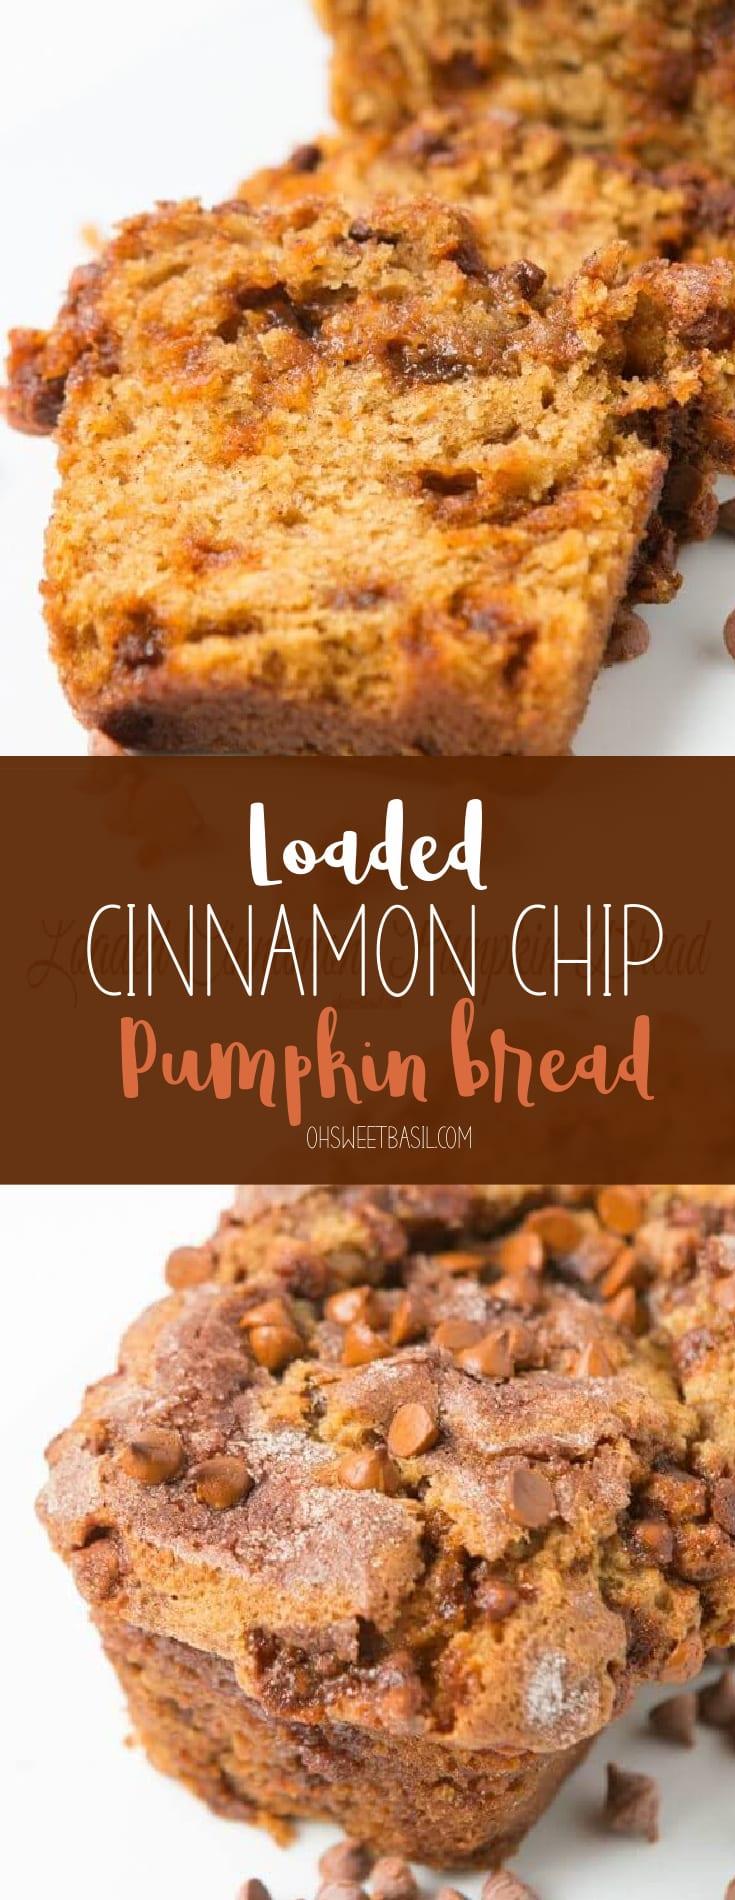 A loaf of cinnamon pumpkin bread